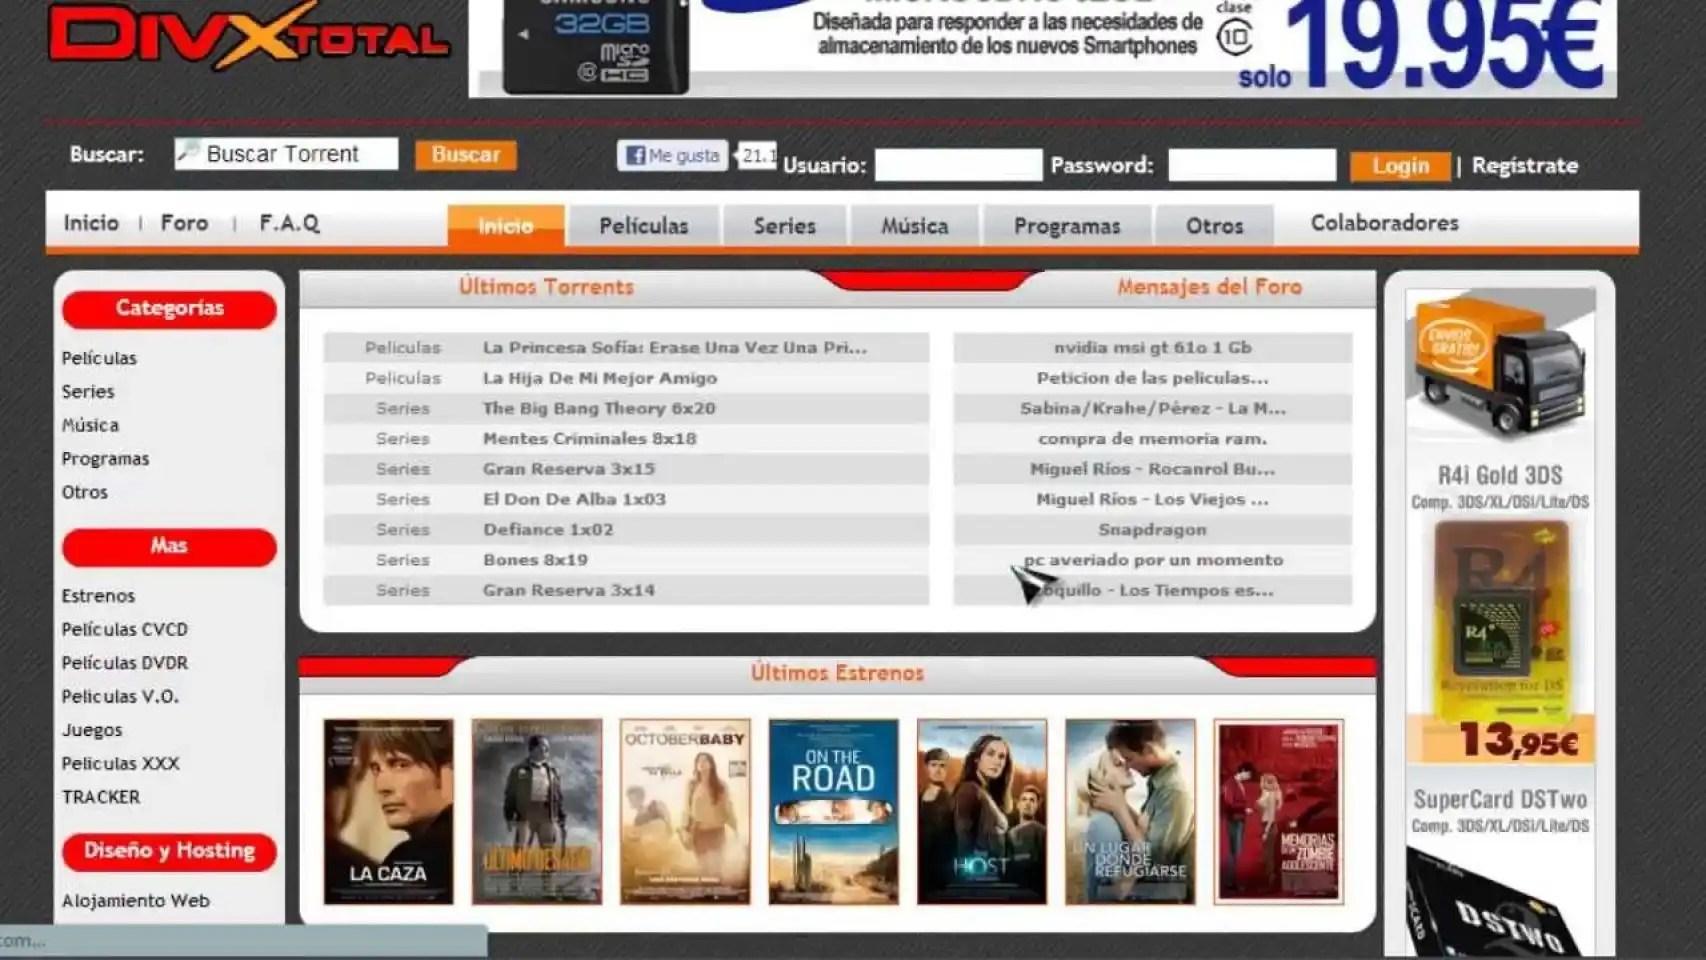 DivxTotal, Estrenos DTL O GamesTorrents: Bloqueadas 23